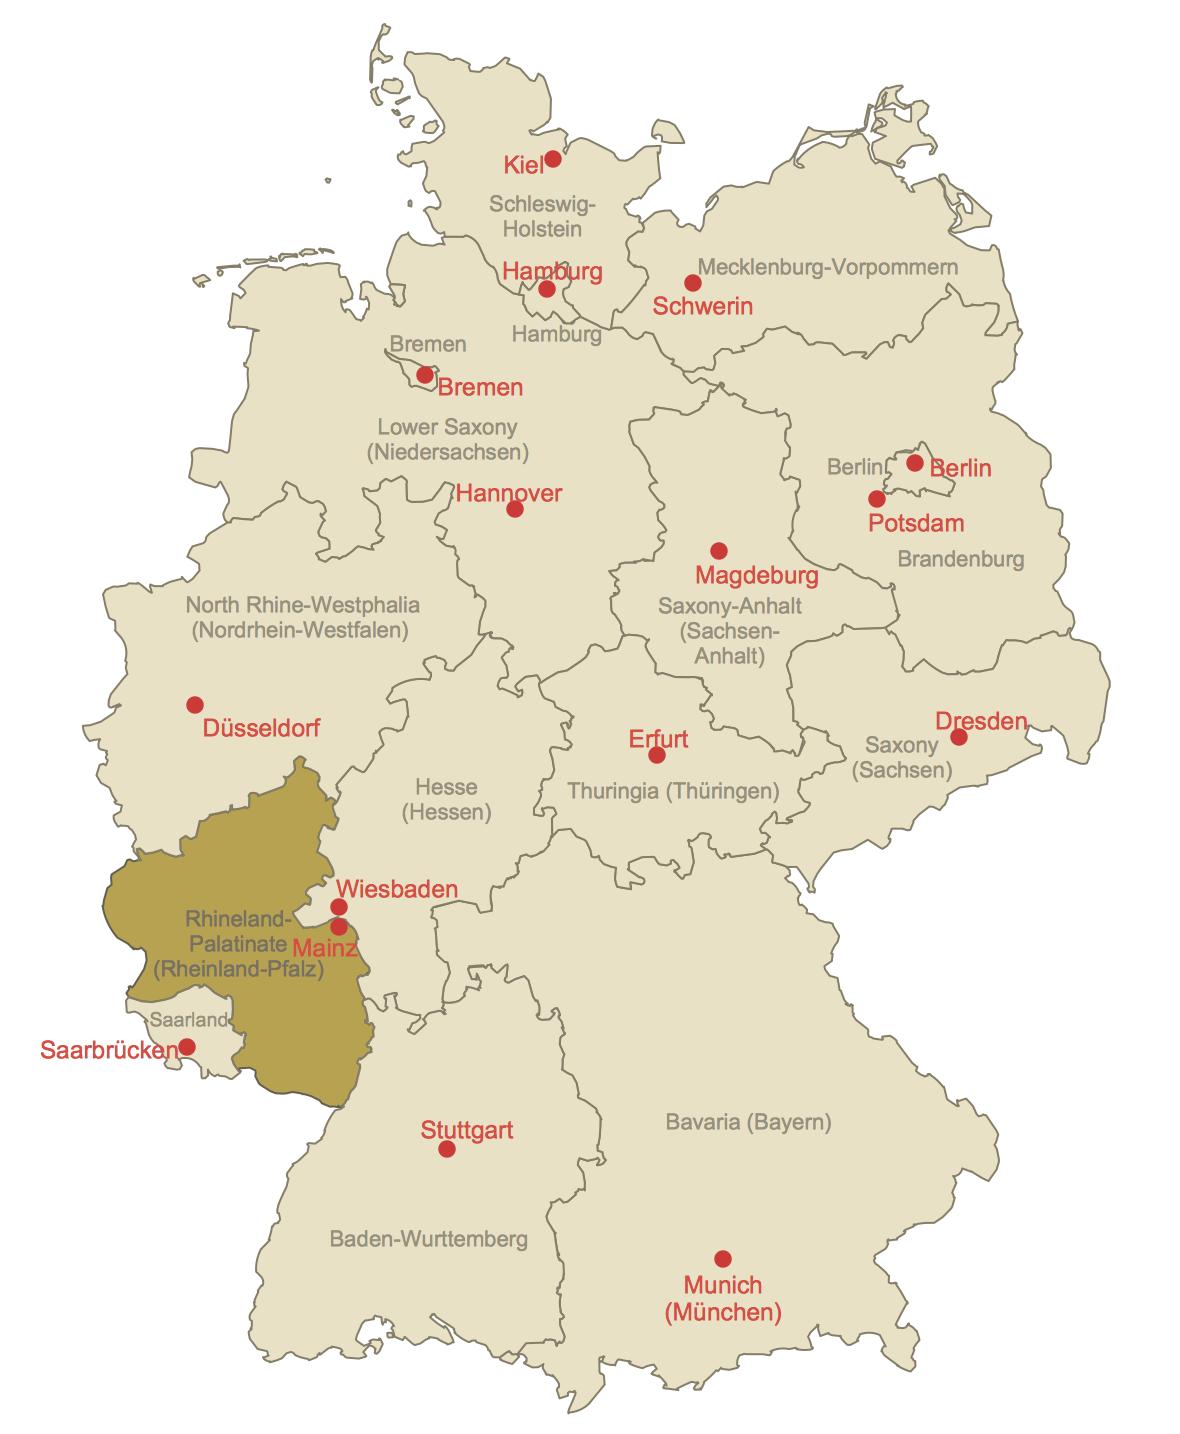 Locator Map of Rhineland-Palatinate